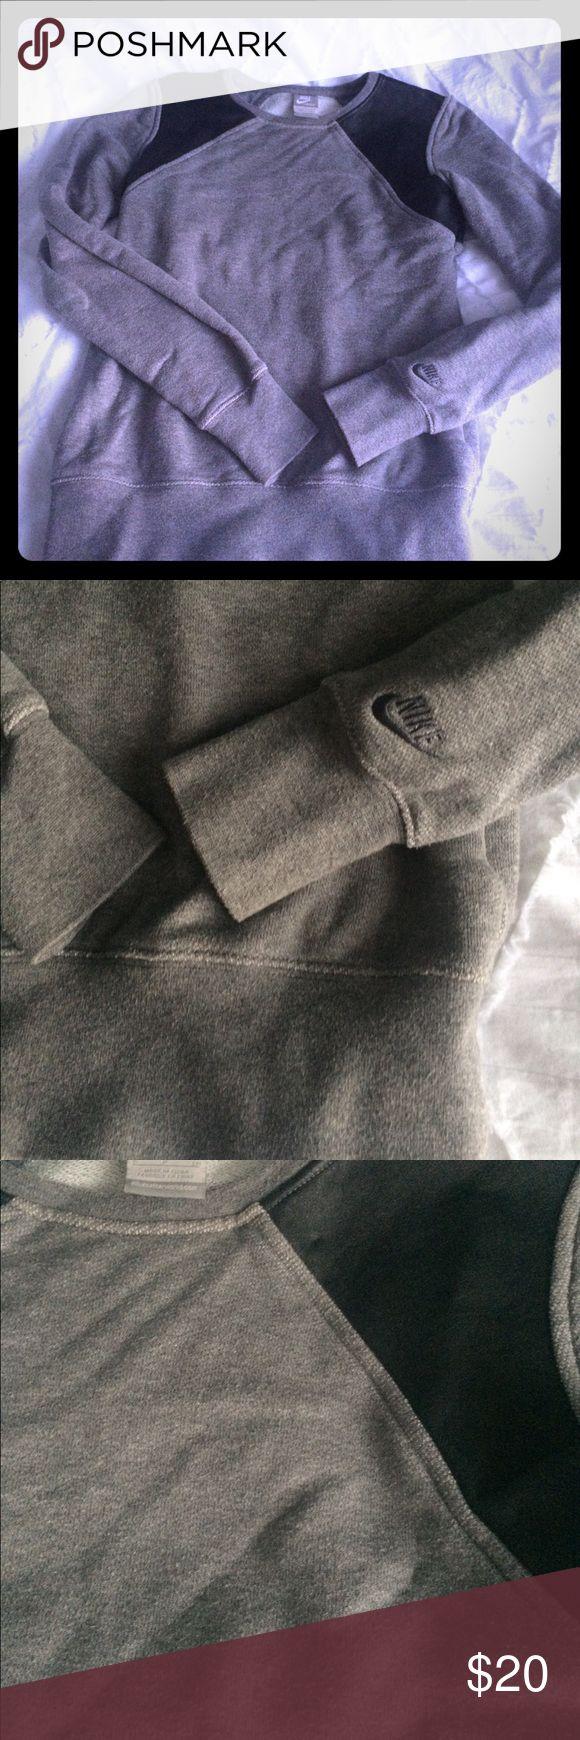 Nike x Stella McCartney collab Vegan leather inset on grey sweatshirt by Stella Mc Cartney for Nike Nike Sweaters Crew & Scoop Necks